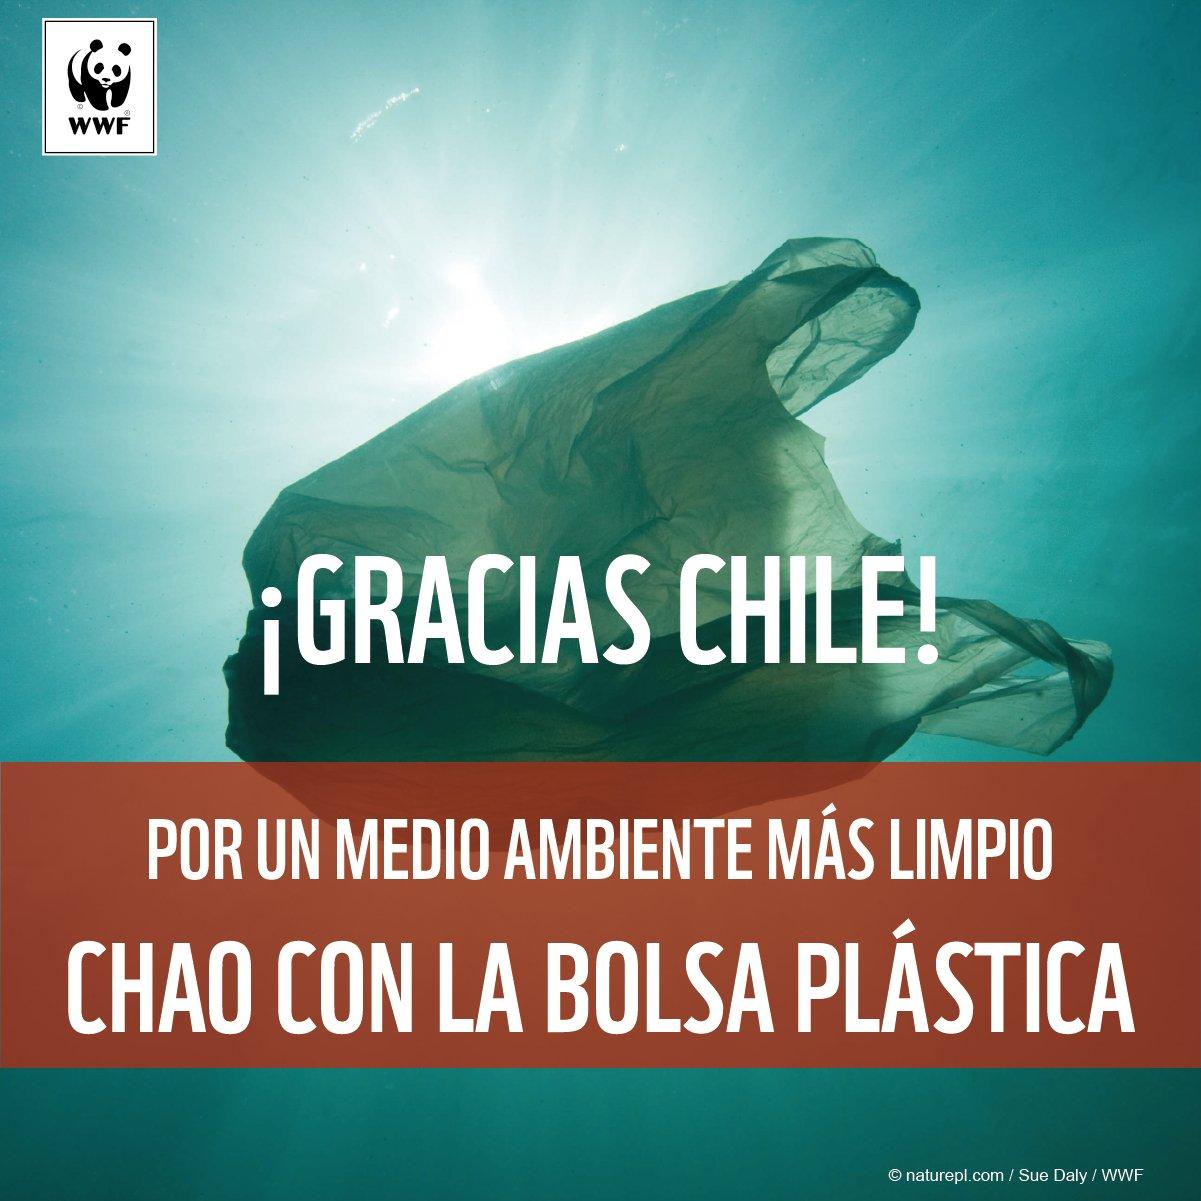 e59939925 WWF Chile no Twitter: